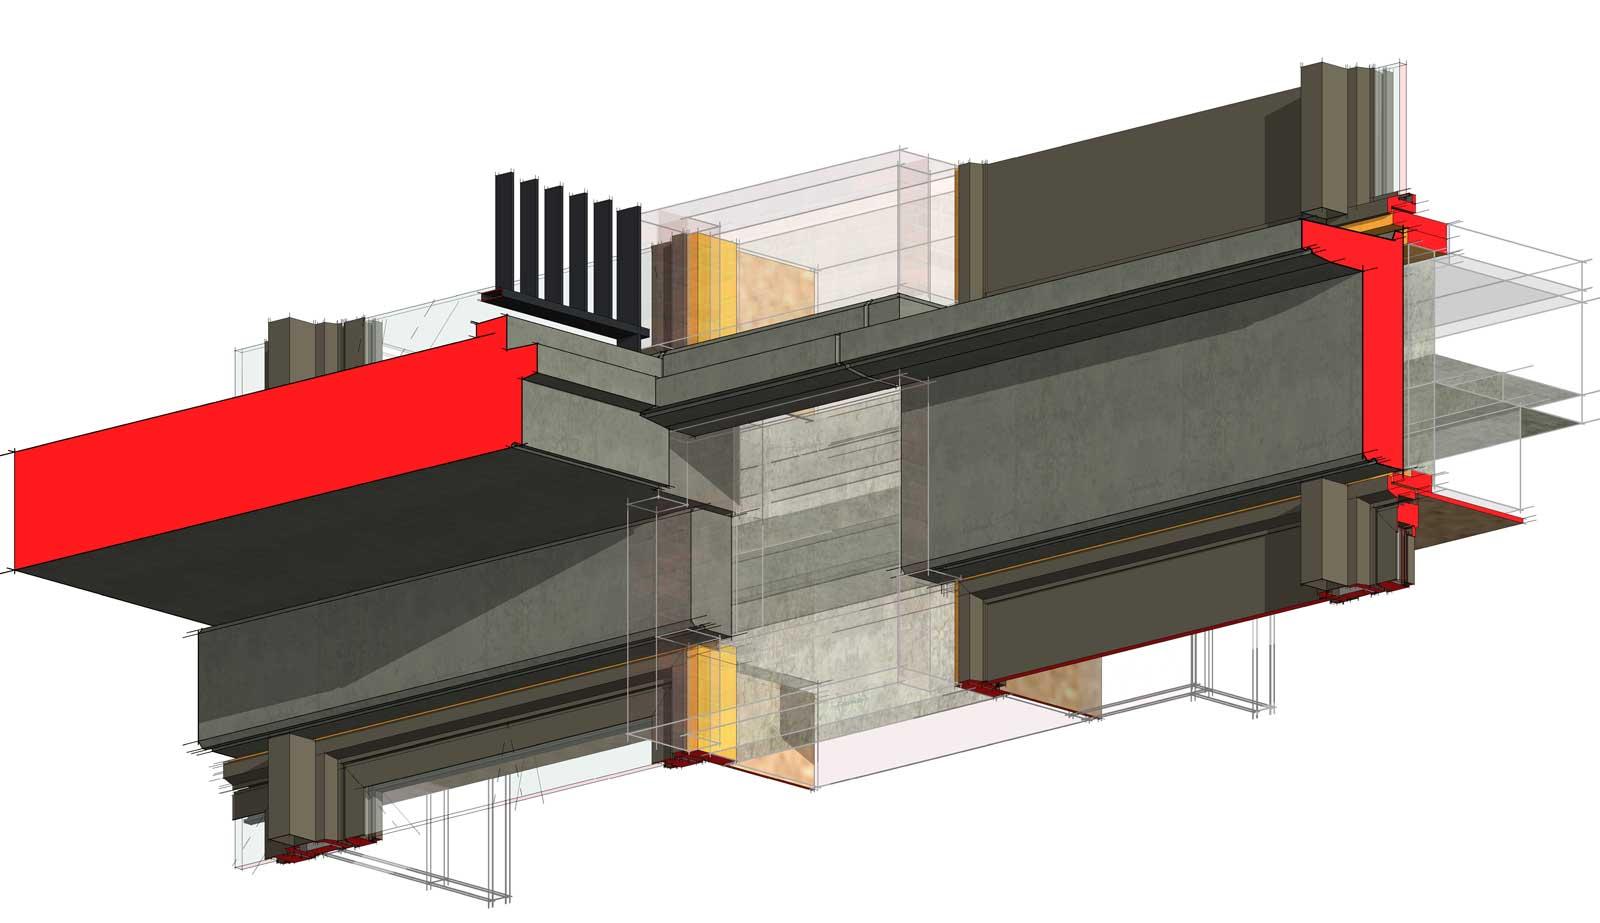 Ede residentie Enka appartementencomplex - 3D detail prefab beton